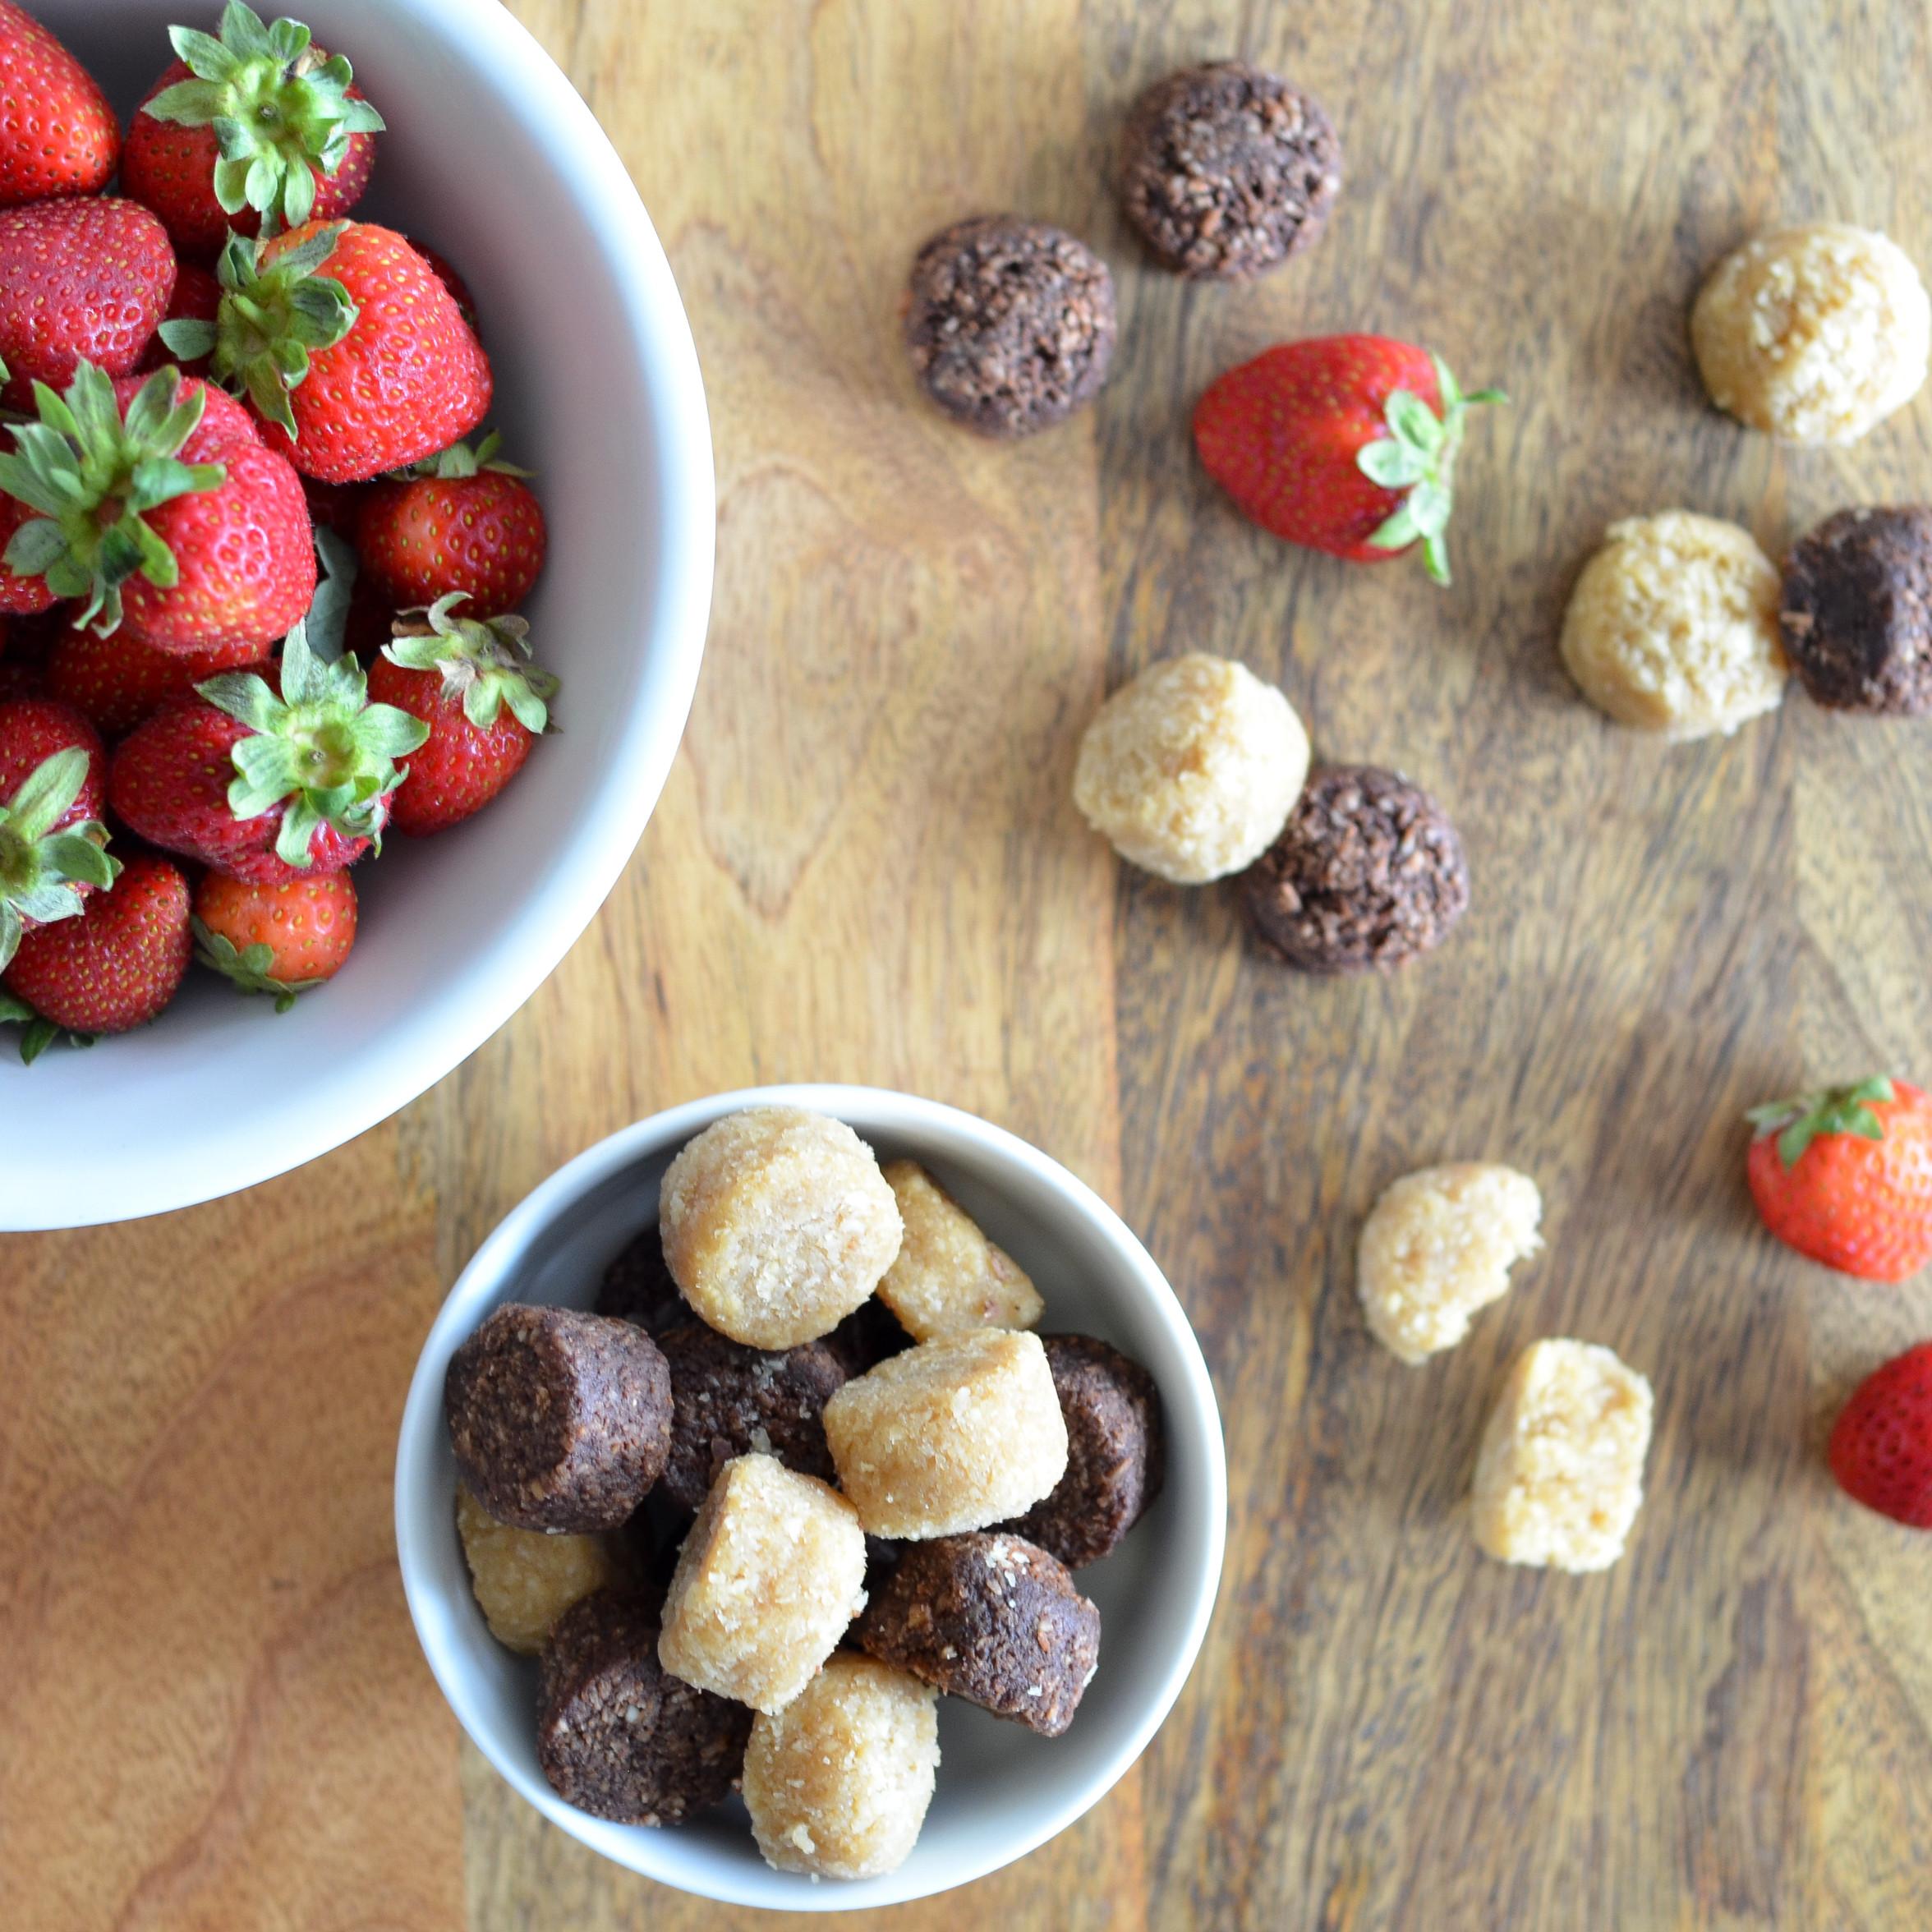 No Bake Healthy Desserts  Five Easy No Bake Healthy Dessert Ideas The